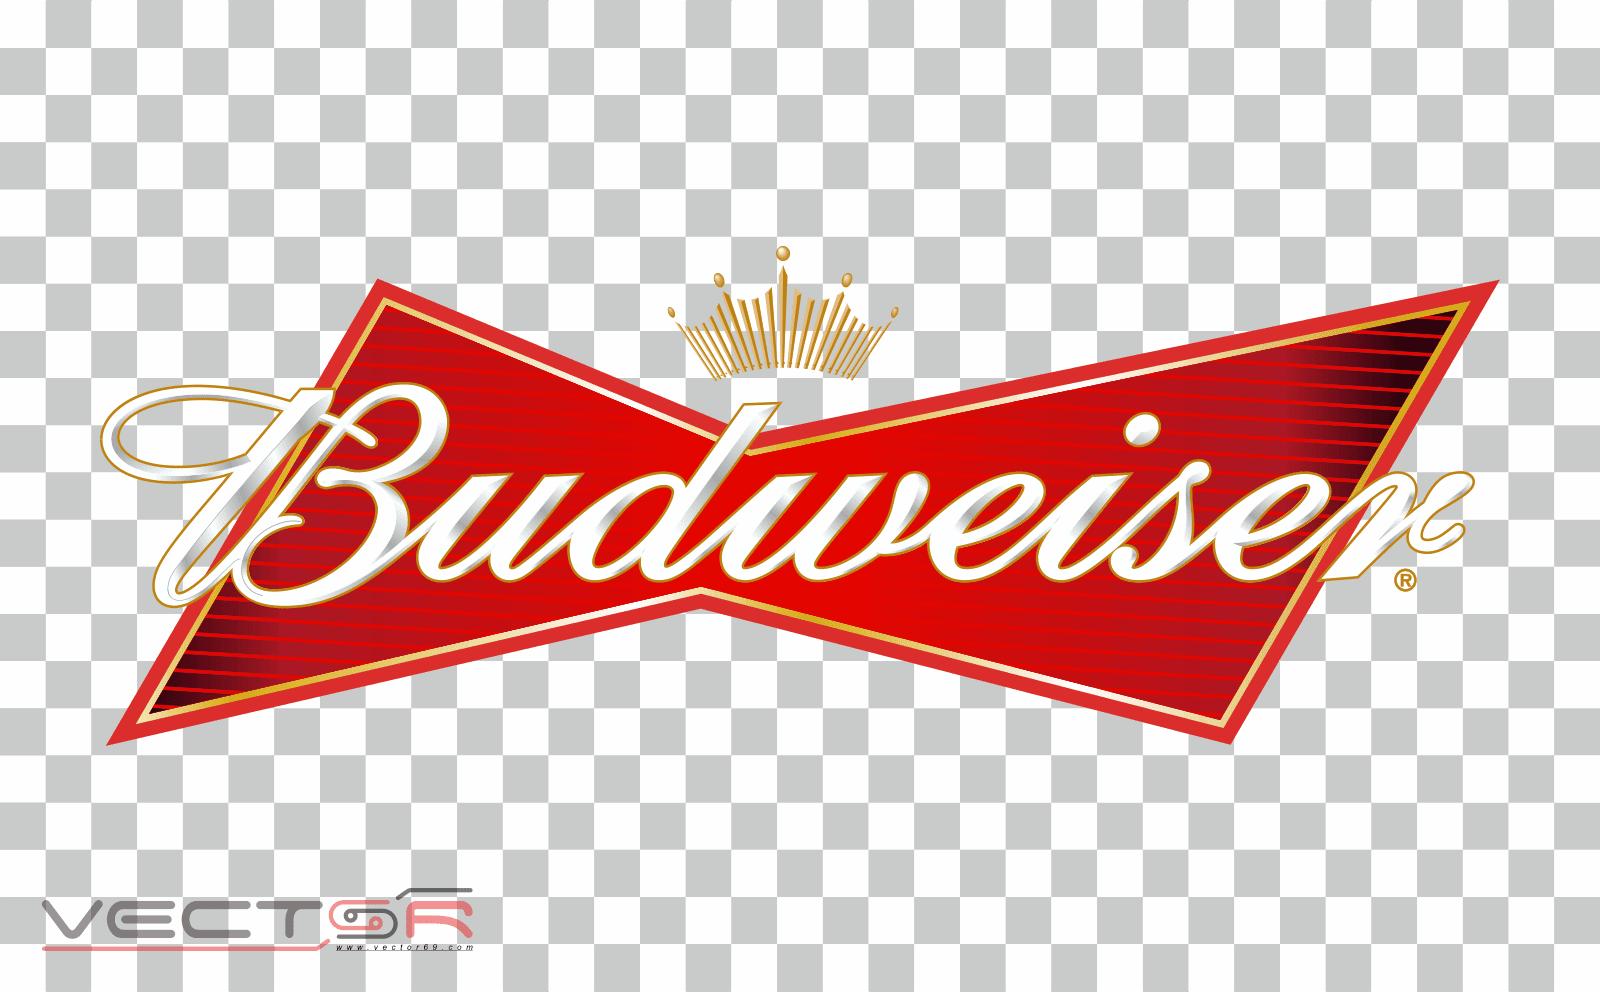 Budweiser (1999) Logo - Download .PNG (Portable Network Graphics) Transparent Images